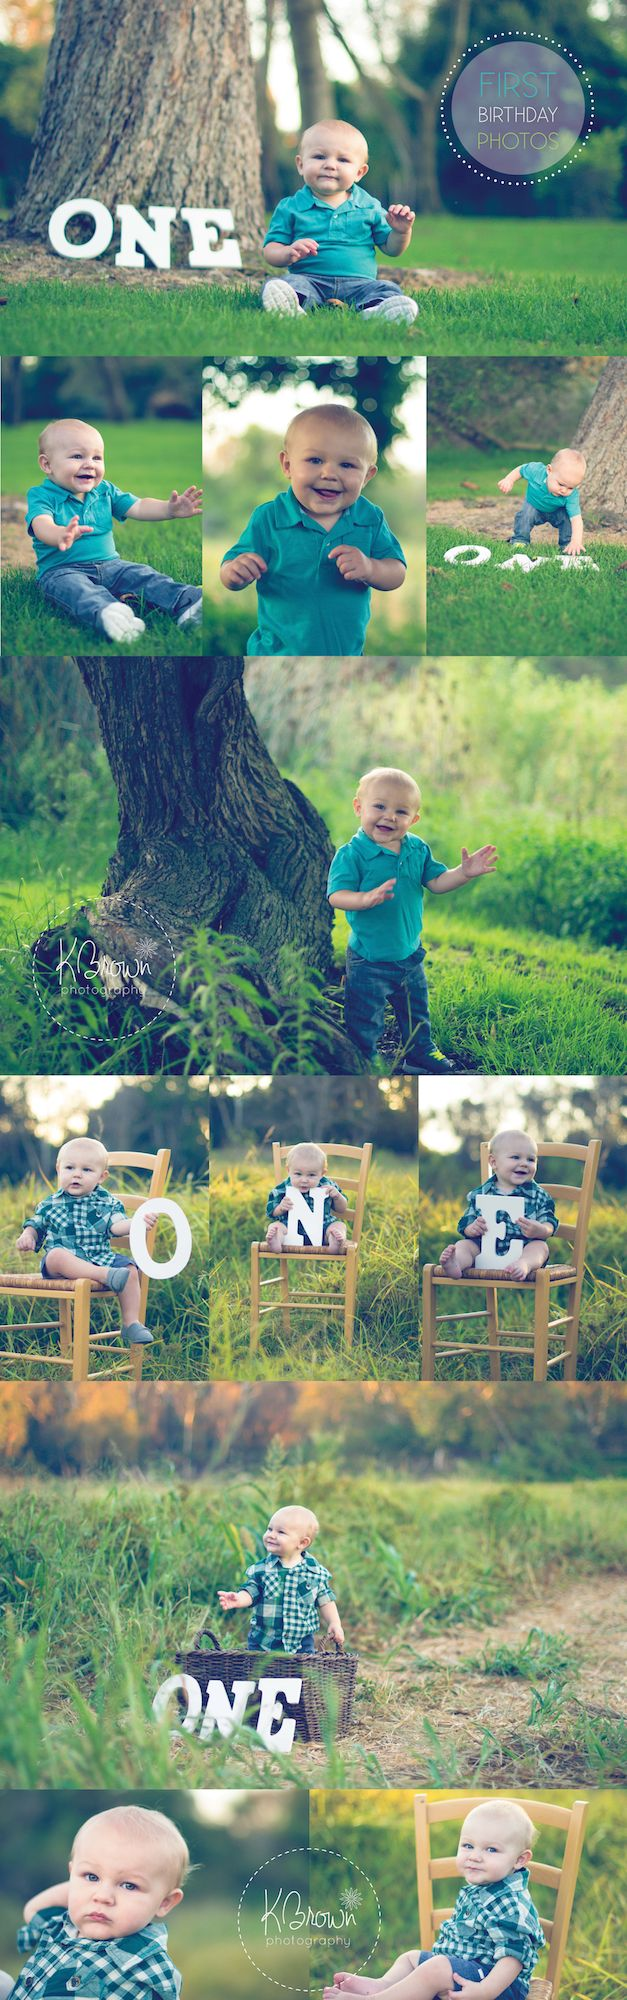 First Birthday Photos. One Year Old photo shoot. Baby boy turns one year old! Huntington Beach, Ca. First Birthday Pictures. One Year Old. #Photography